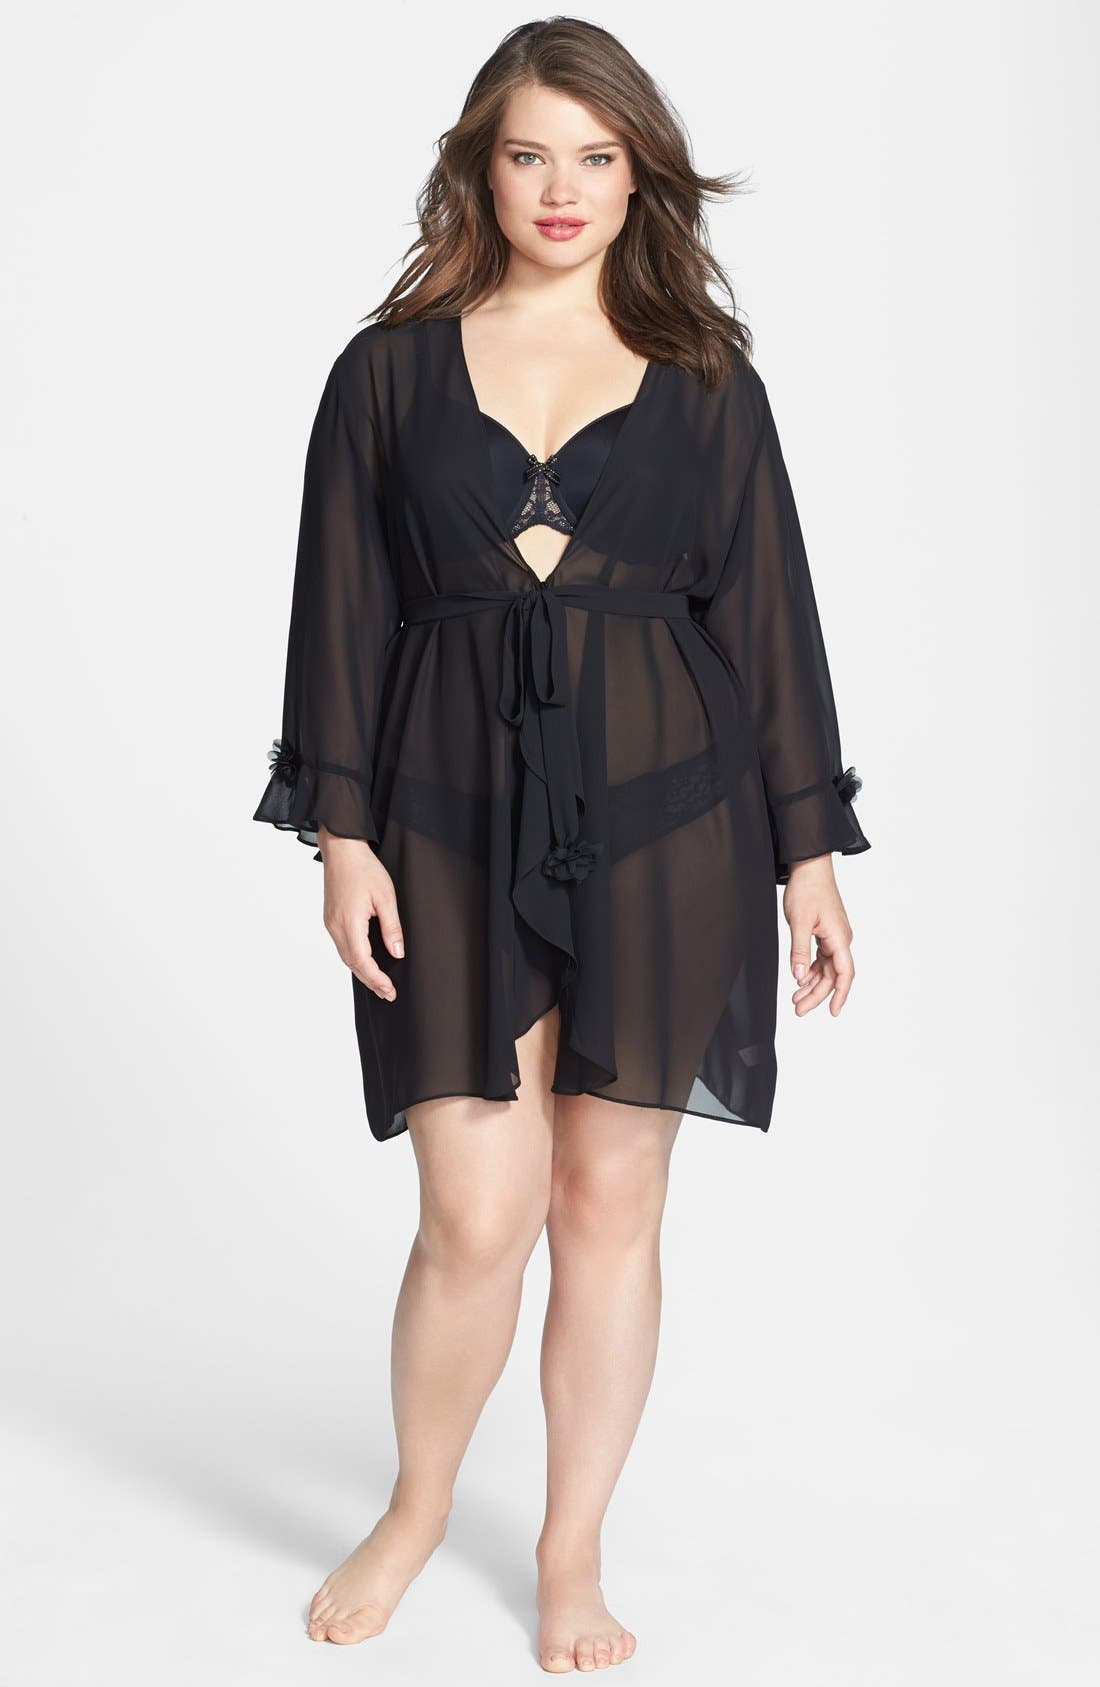 Alternate Image 1 Selected - Oscar de la Renta 'Night & Day' Sheer Georgette Robe (Plus Size)